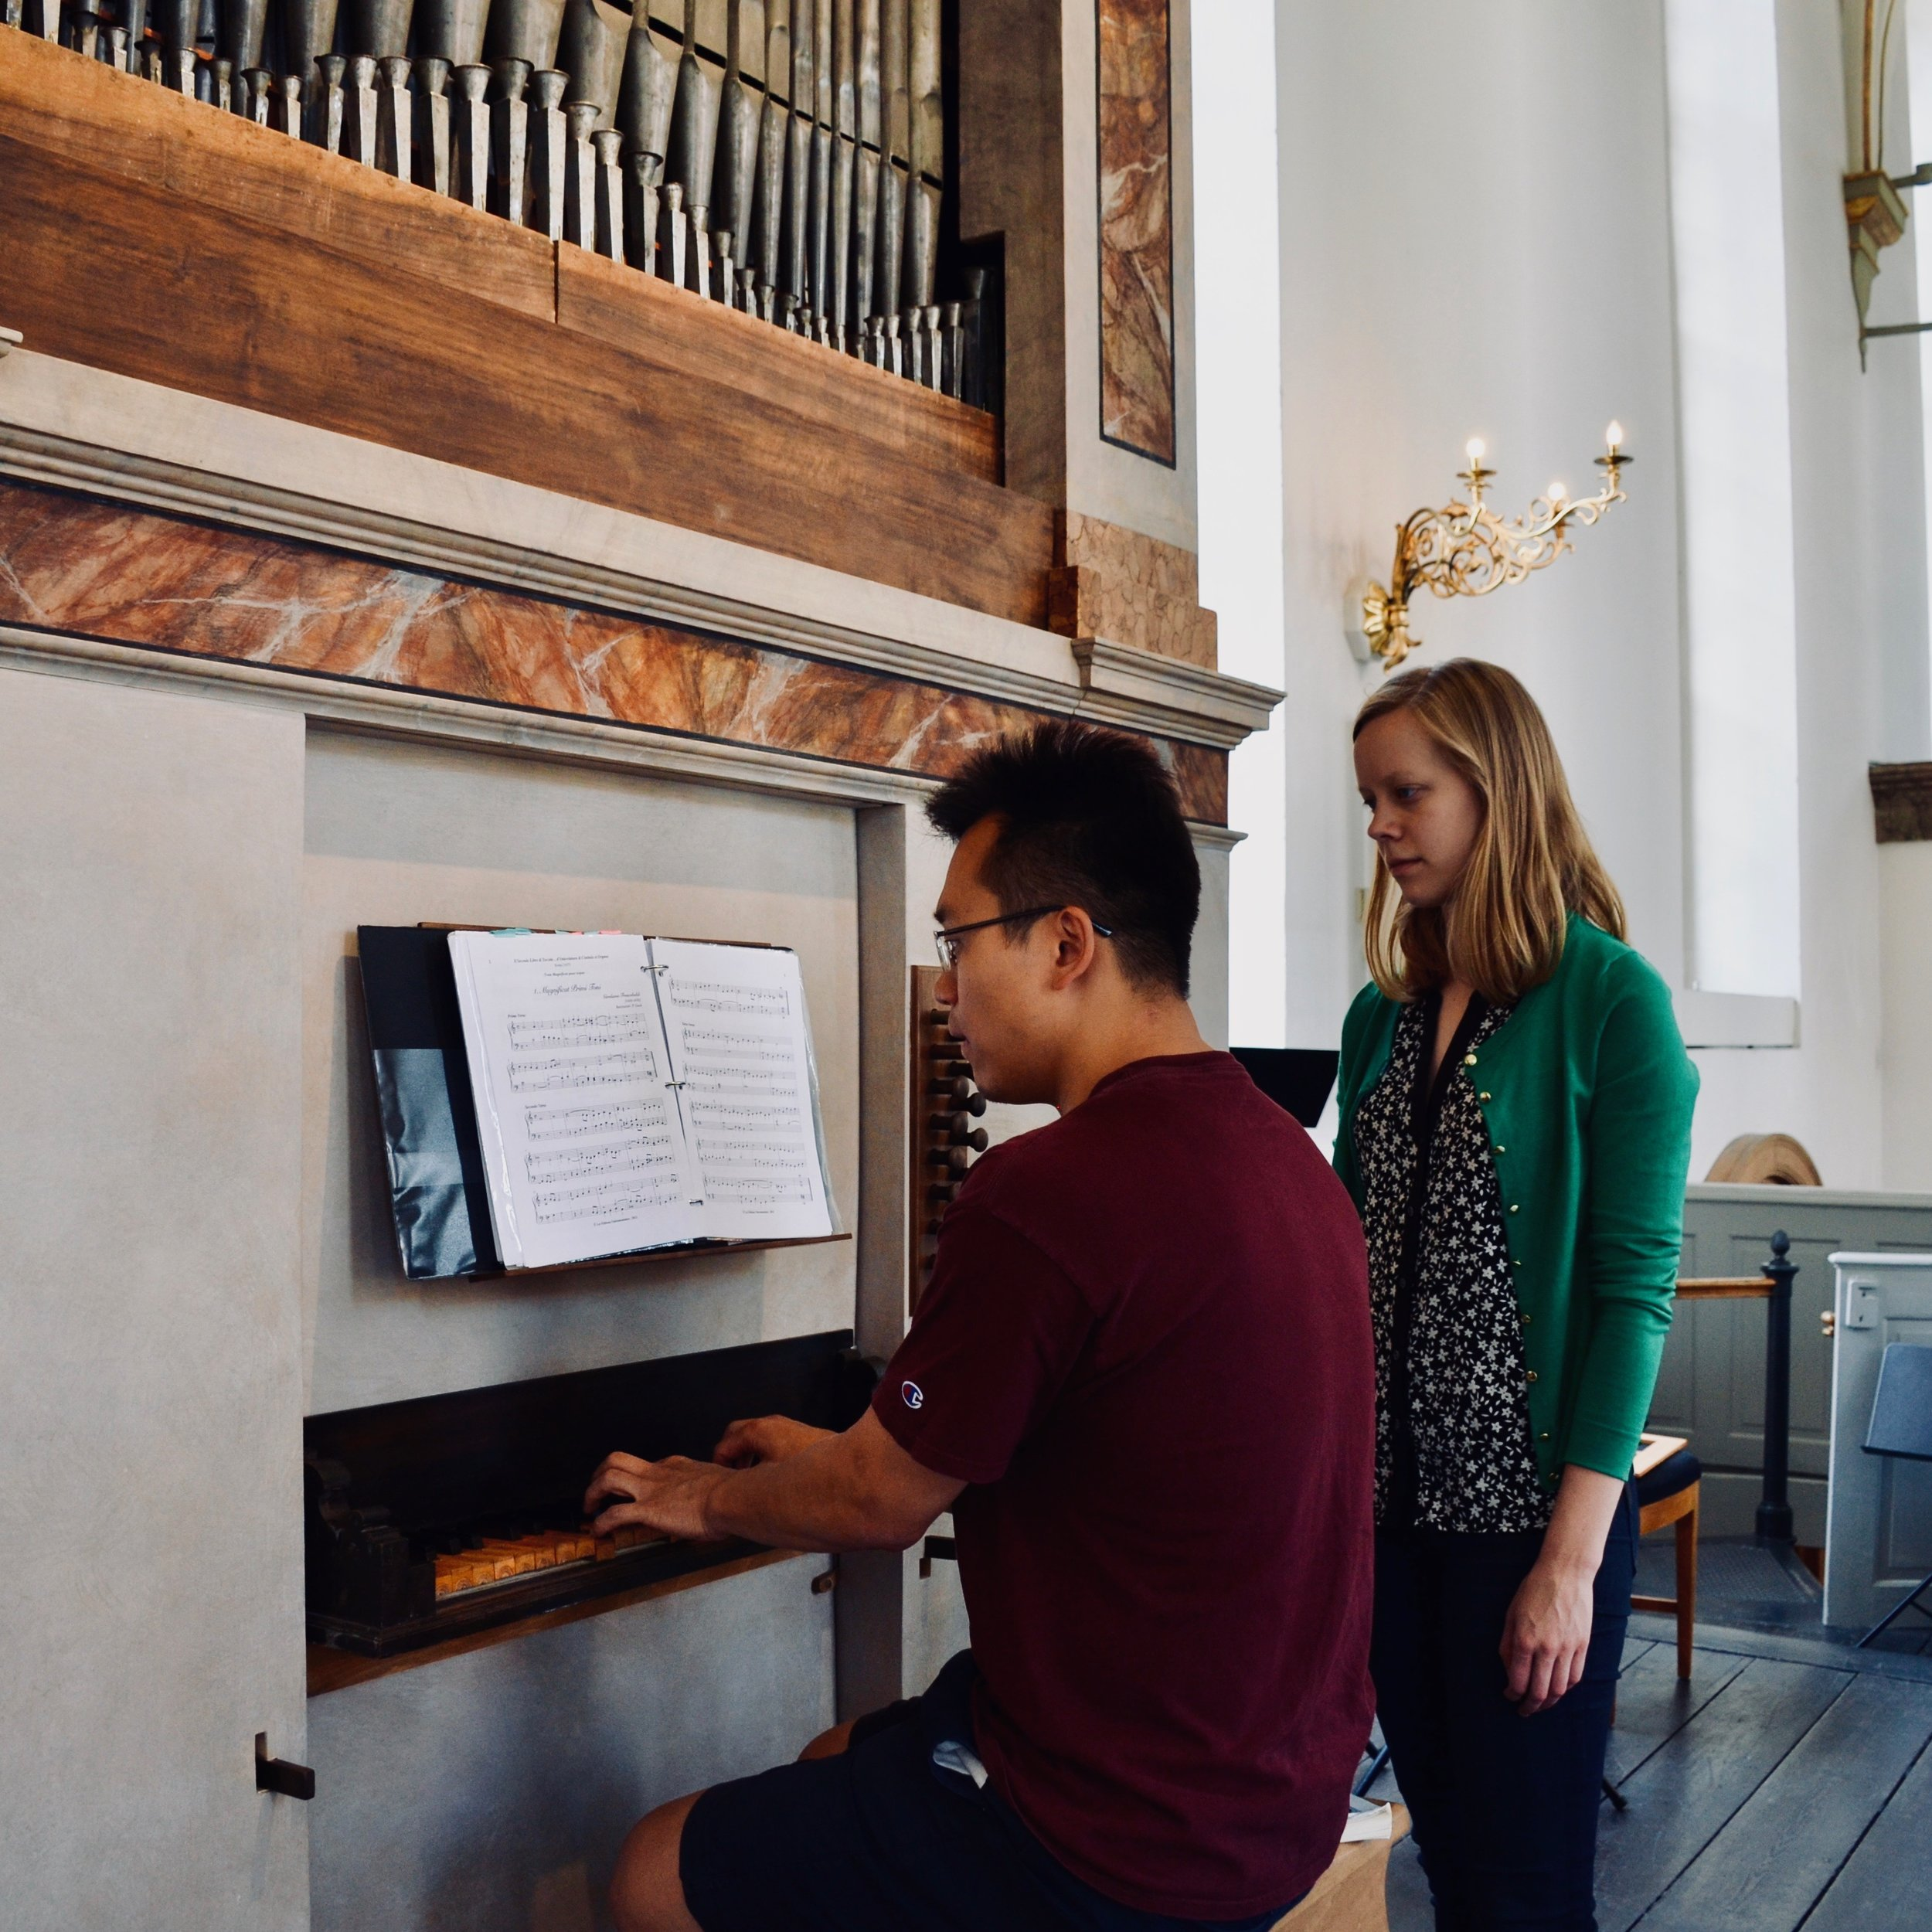 Adrian Cho plays the the Italian baroque organ in Trinitatis Kirke, Copenhagen.